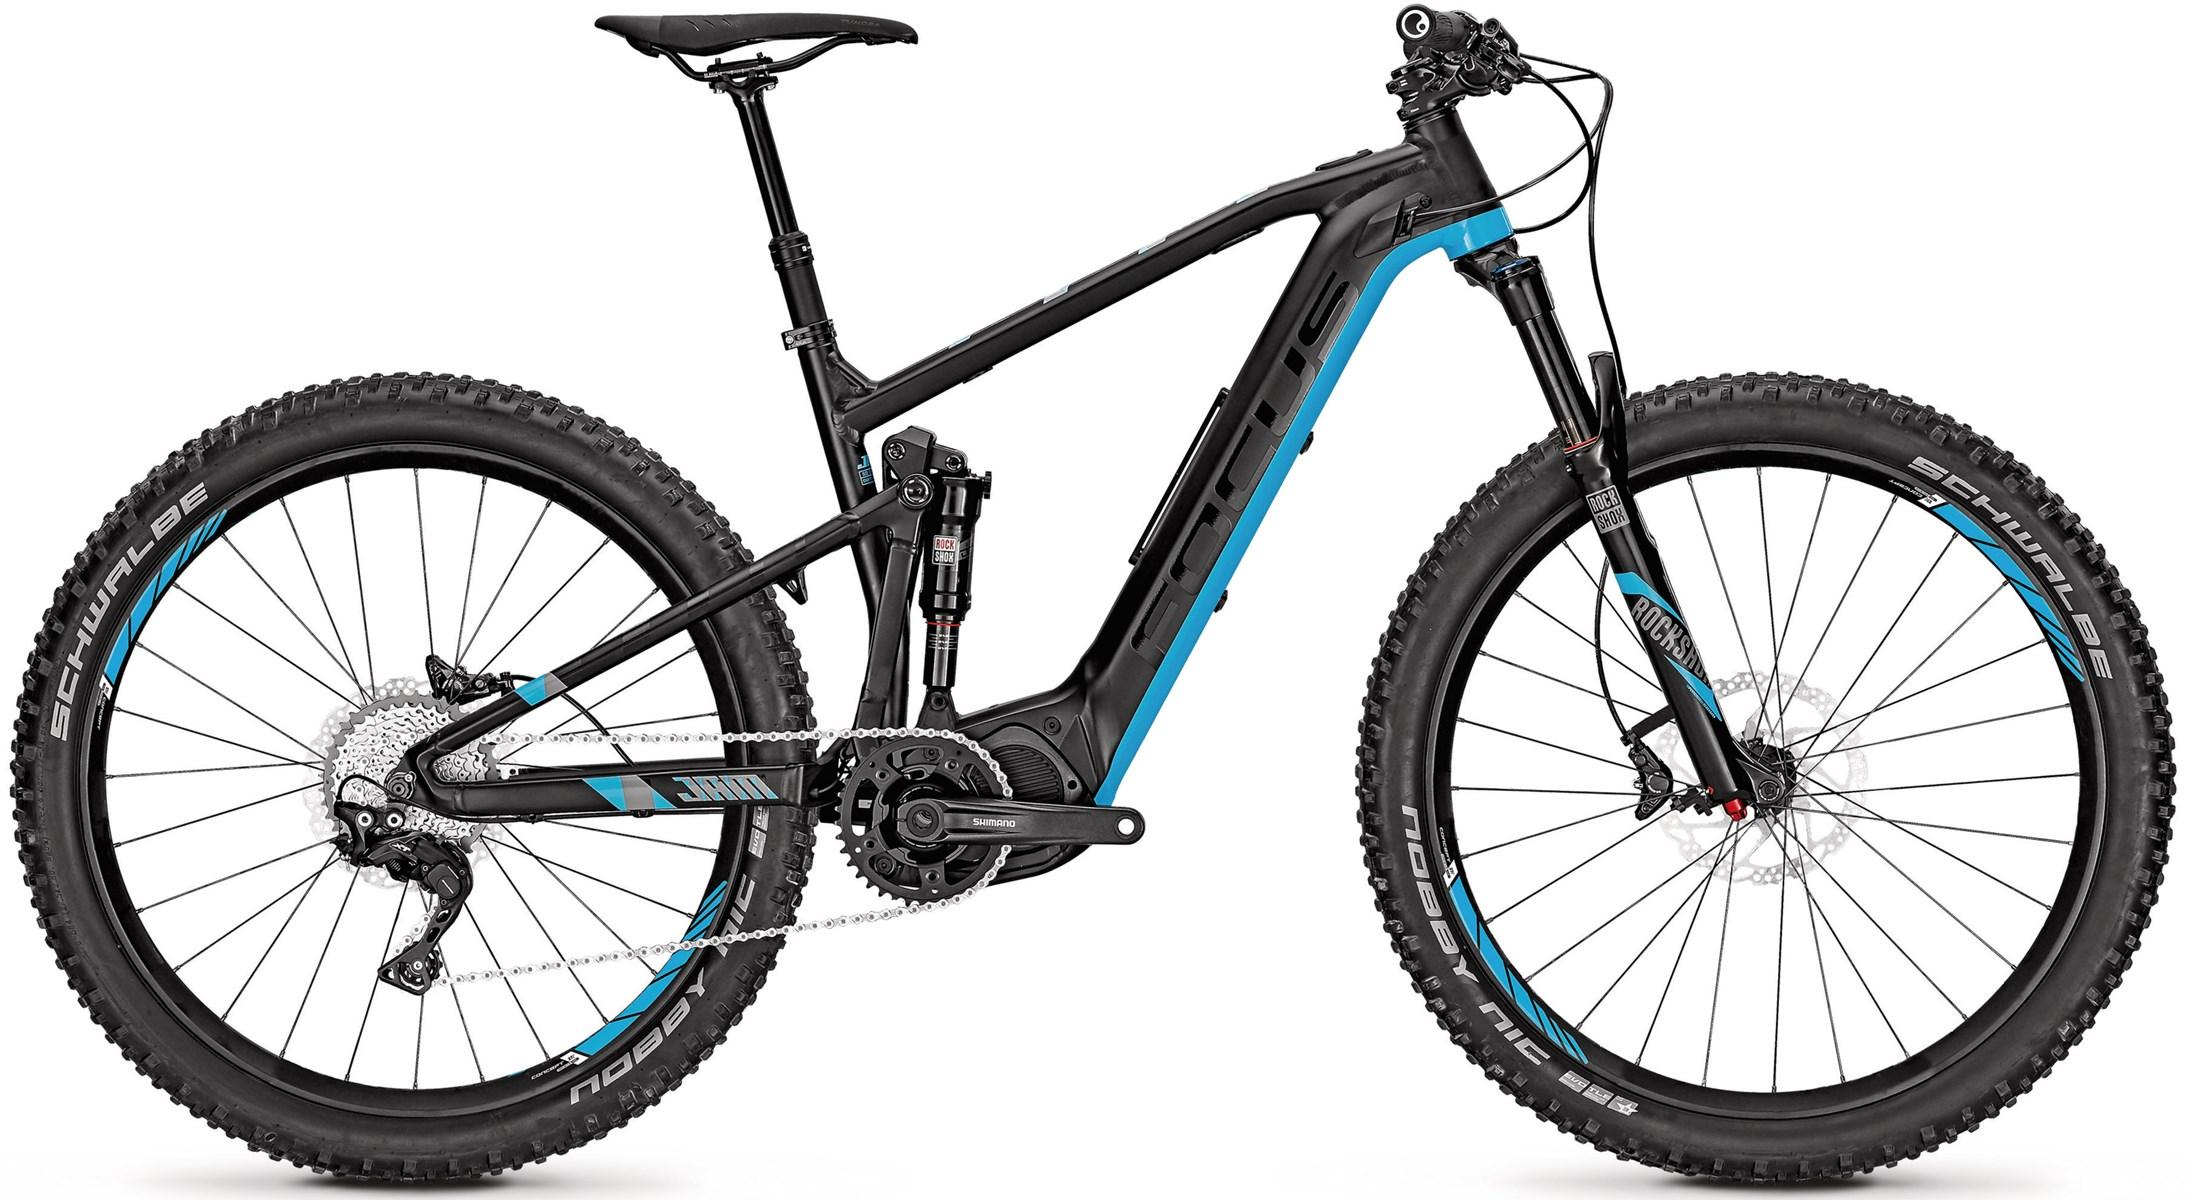 df4fe2e18d3 Focus Jam2 Plus Electric Bike 2017 Black/Blue £2,999.99